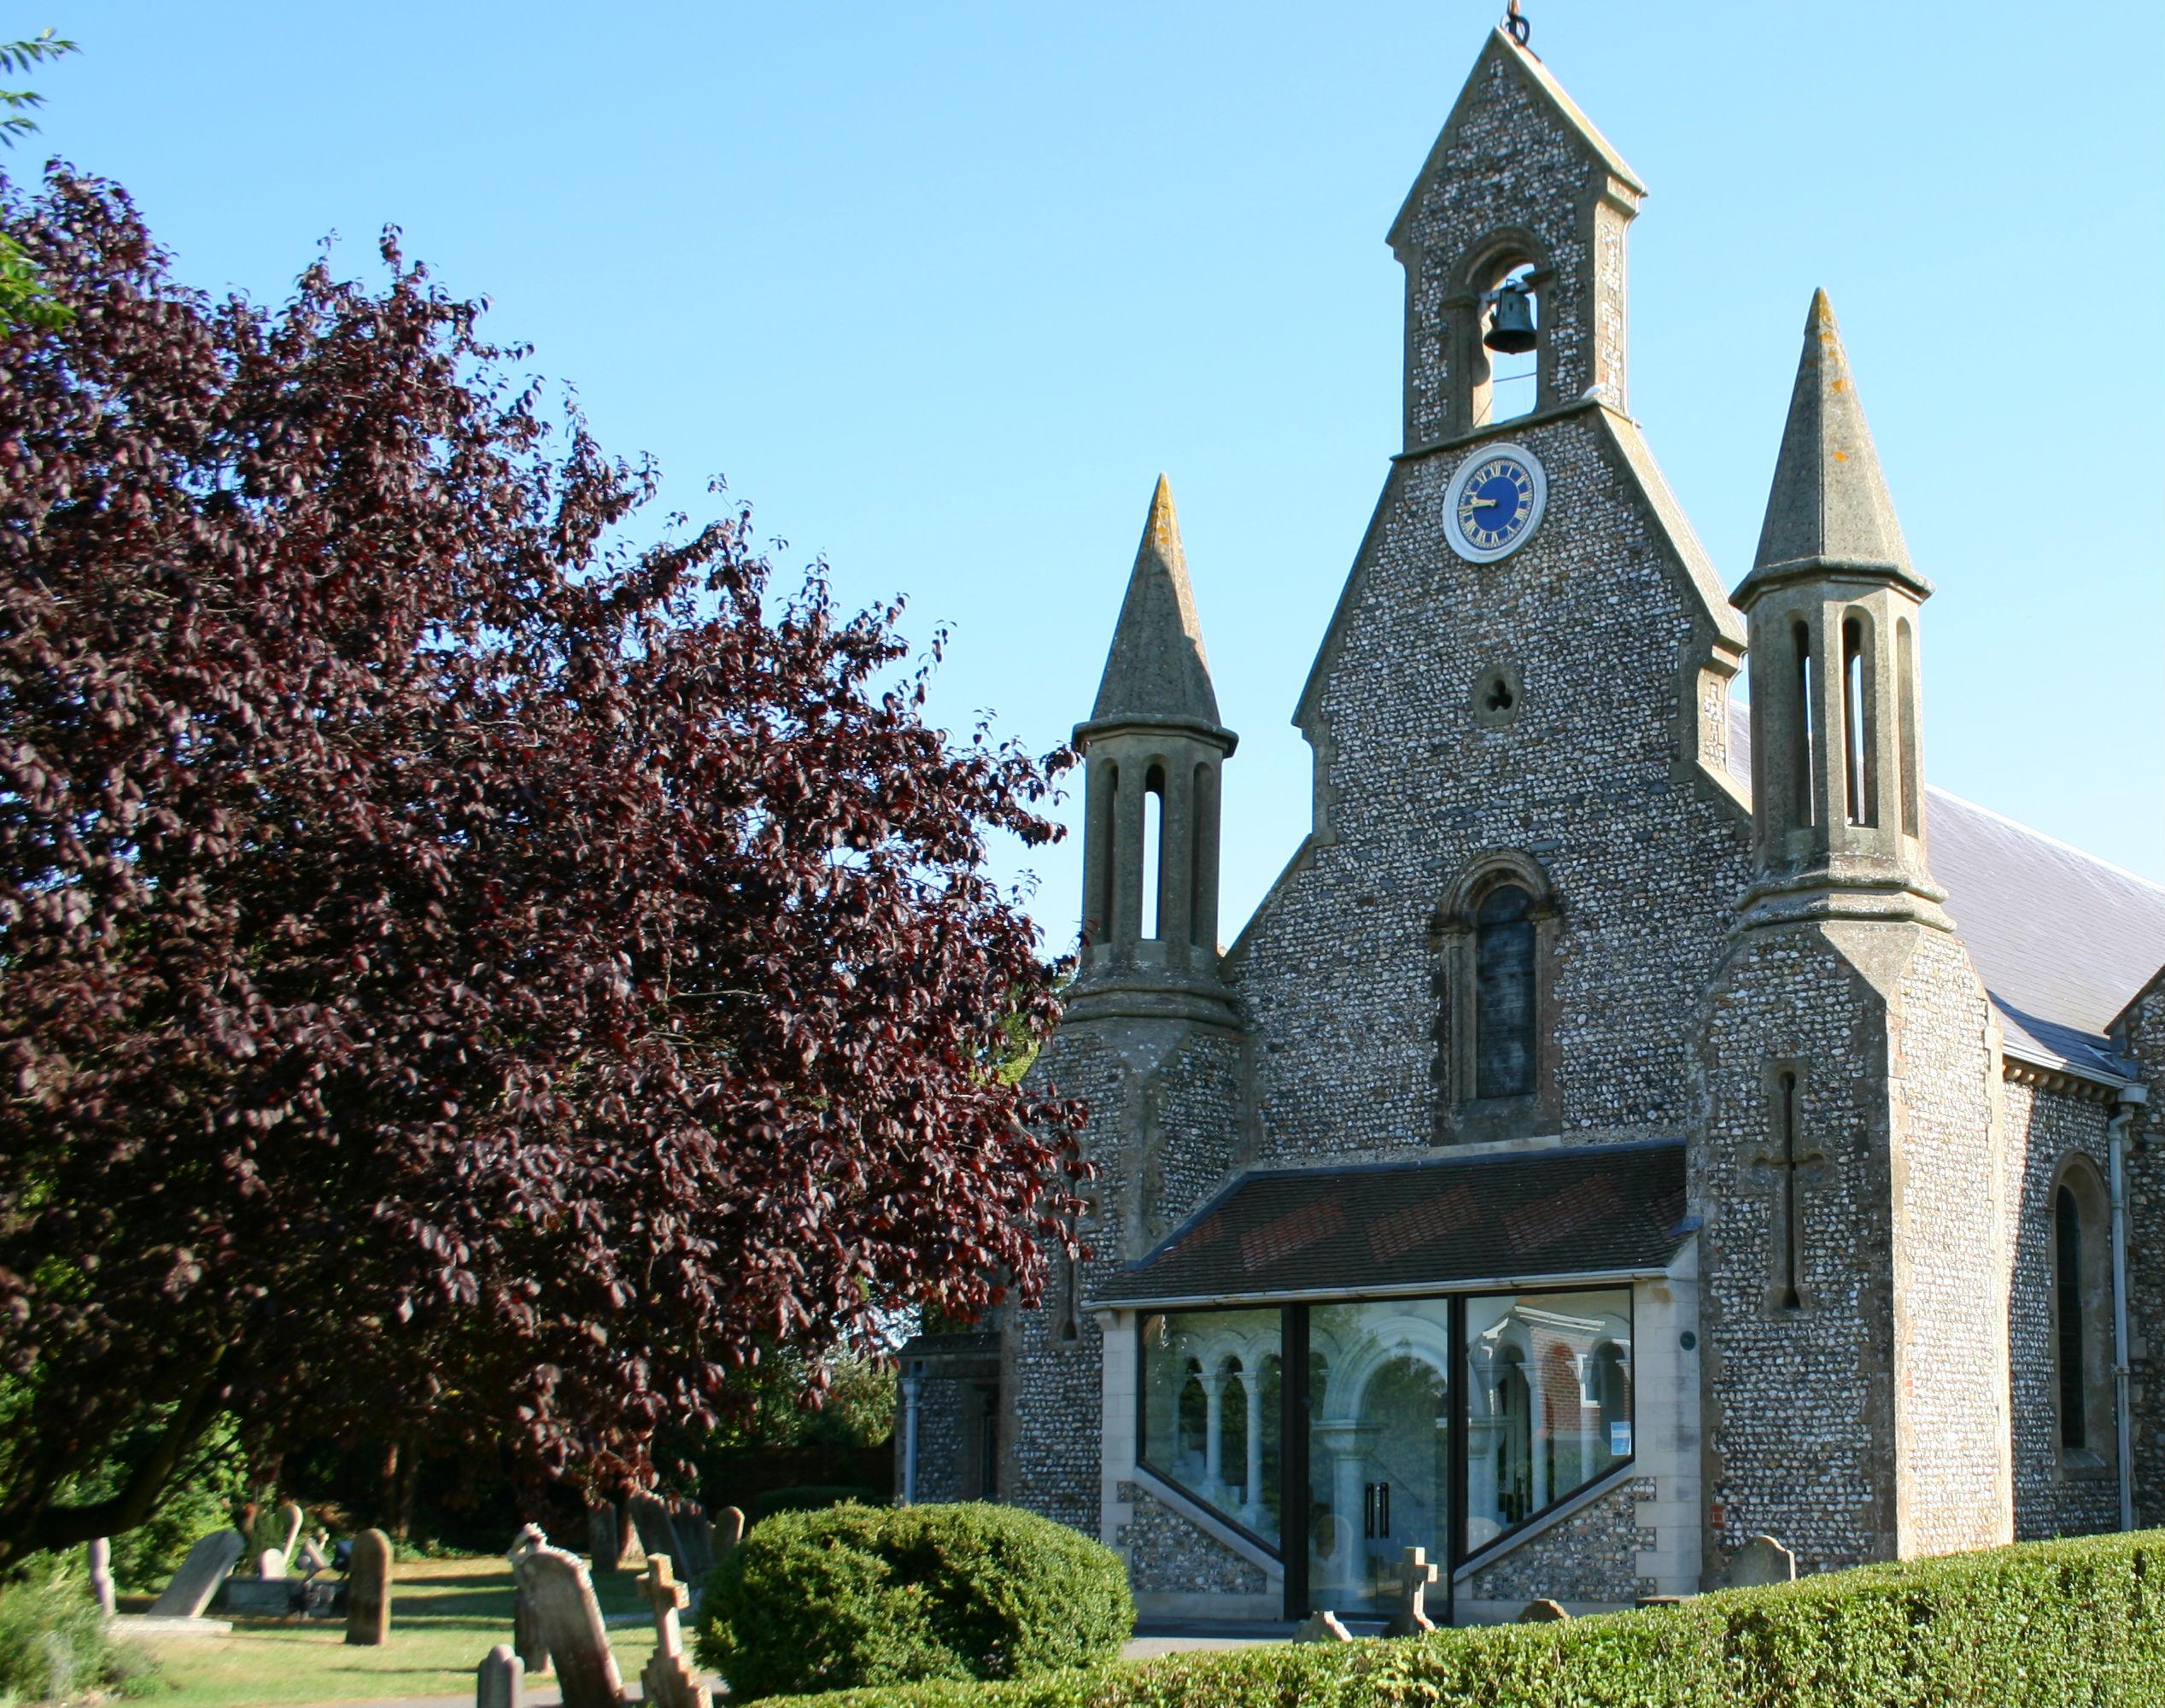 St James Church, Emsworth